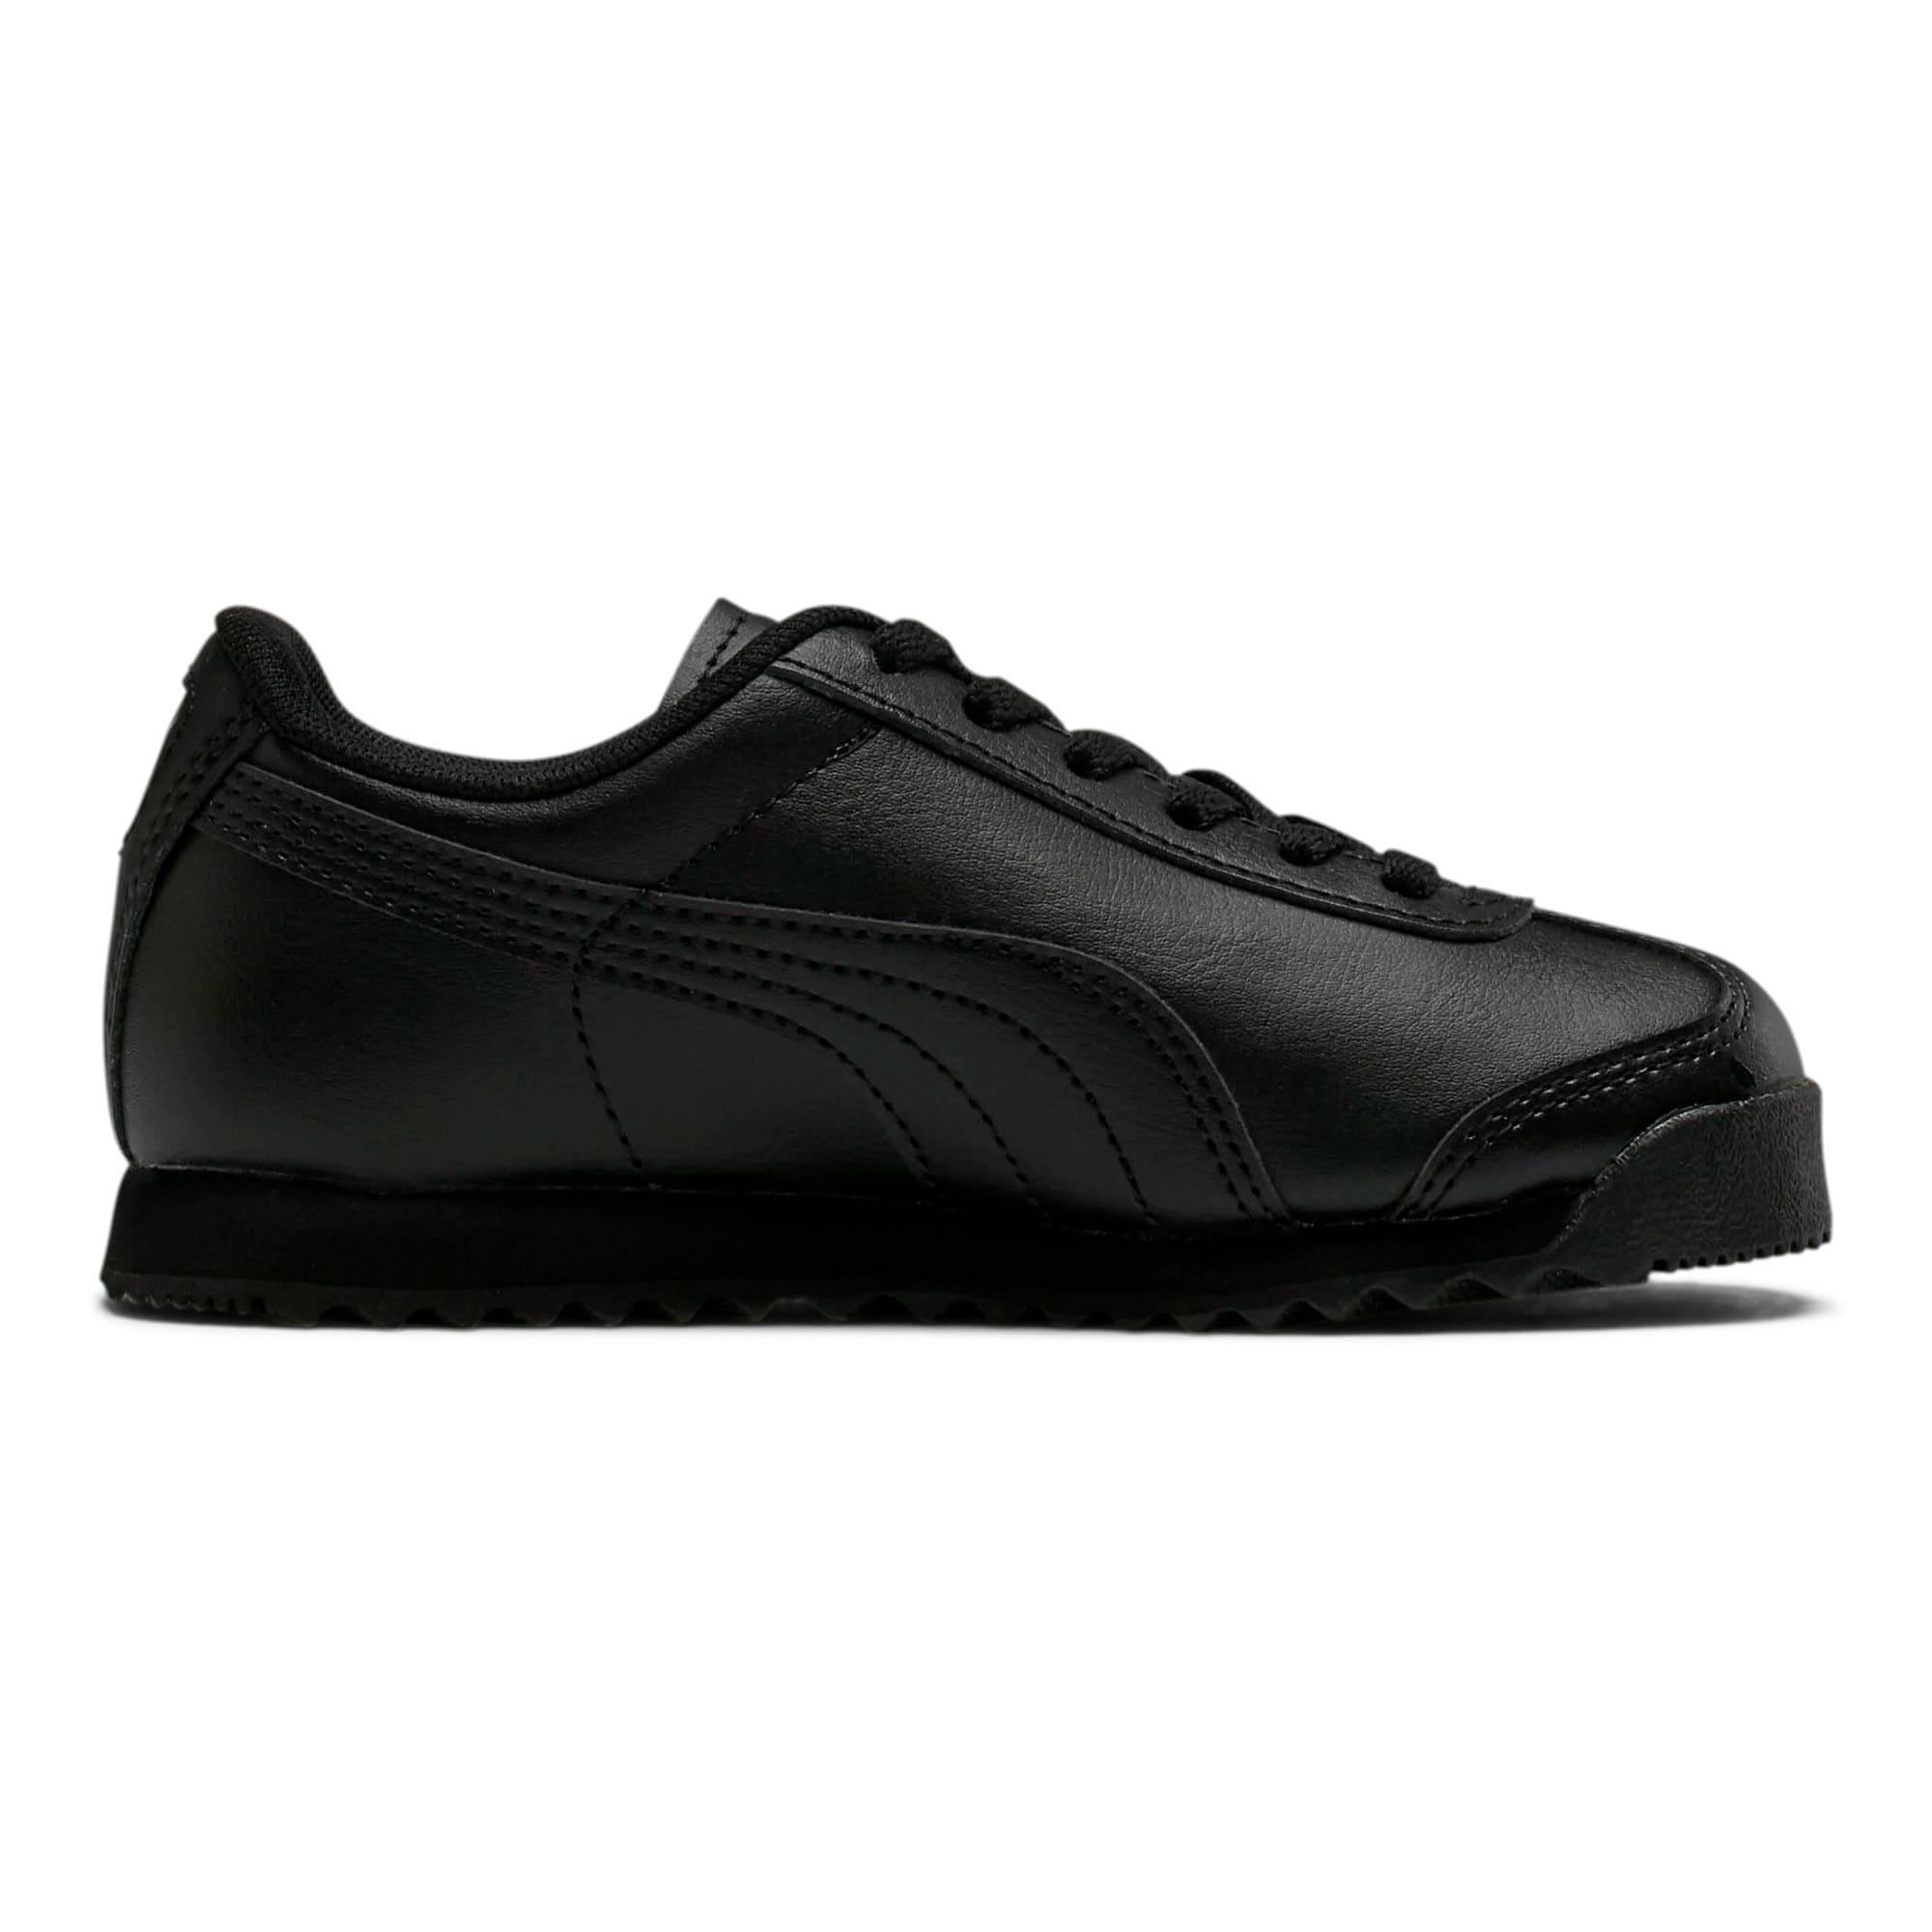 Thumbnail 5 of Roma Basic Little Kids' Shoes, Puma Black-Puma Black, medium